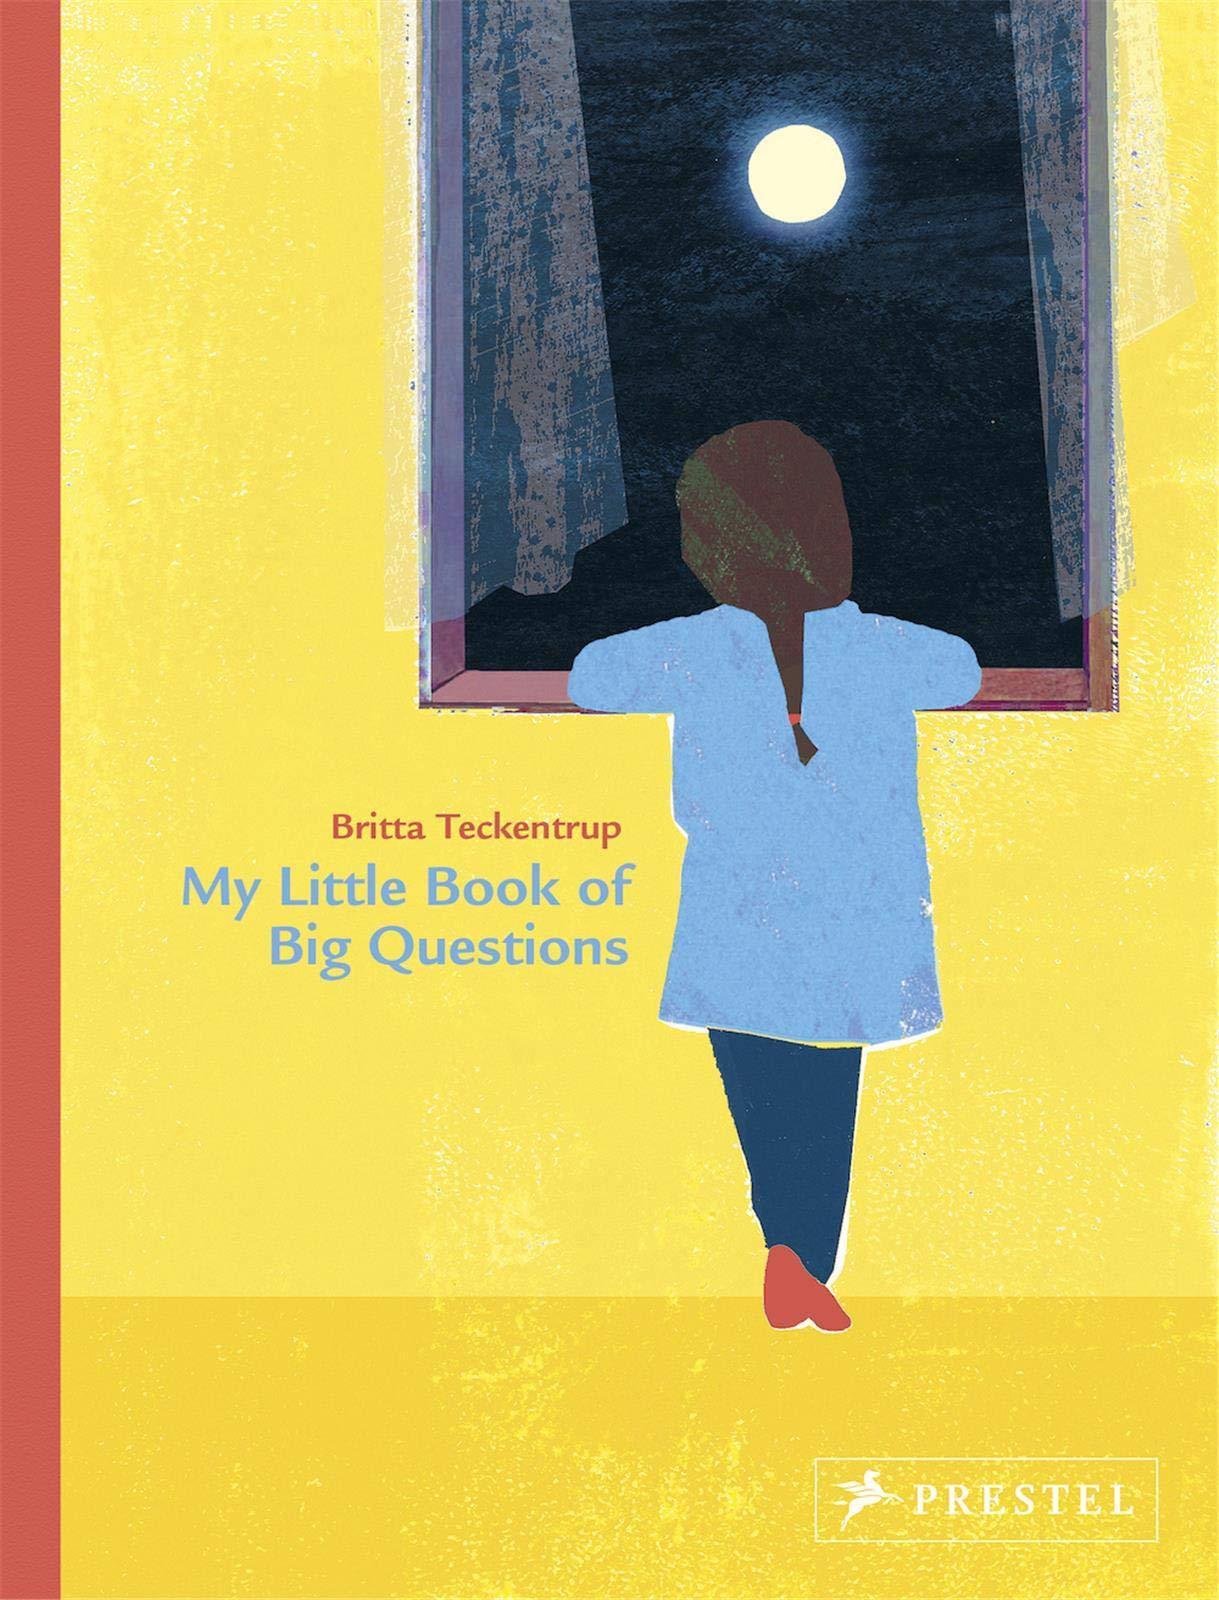 My Little Book of Big Questions: by Britta Teckentrup: Amazon.co.uk: Britta  Teckentrup: 9783791373768: Books